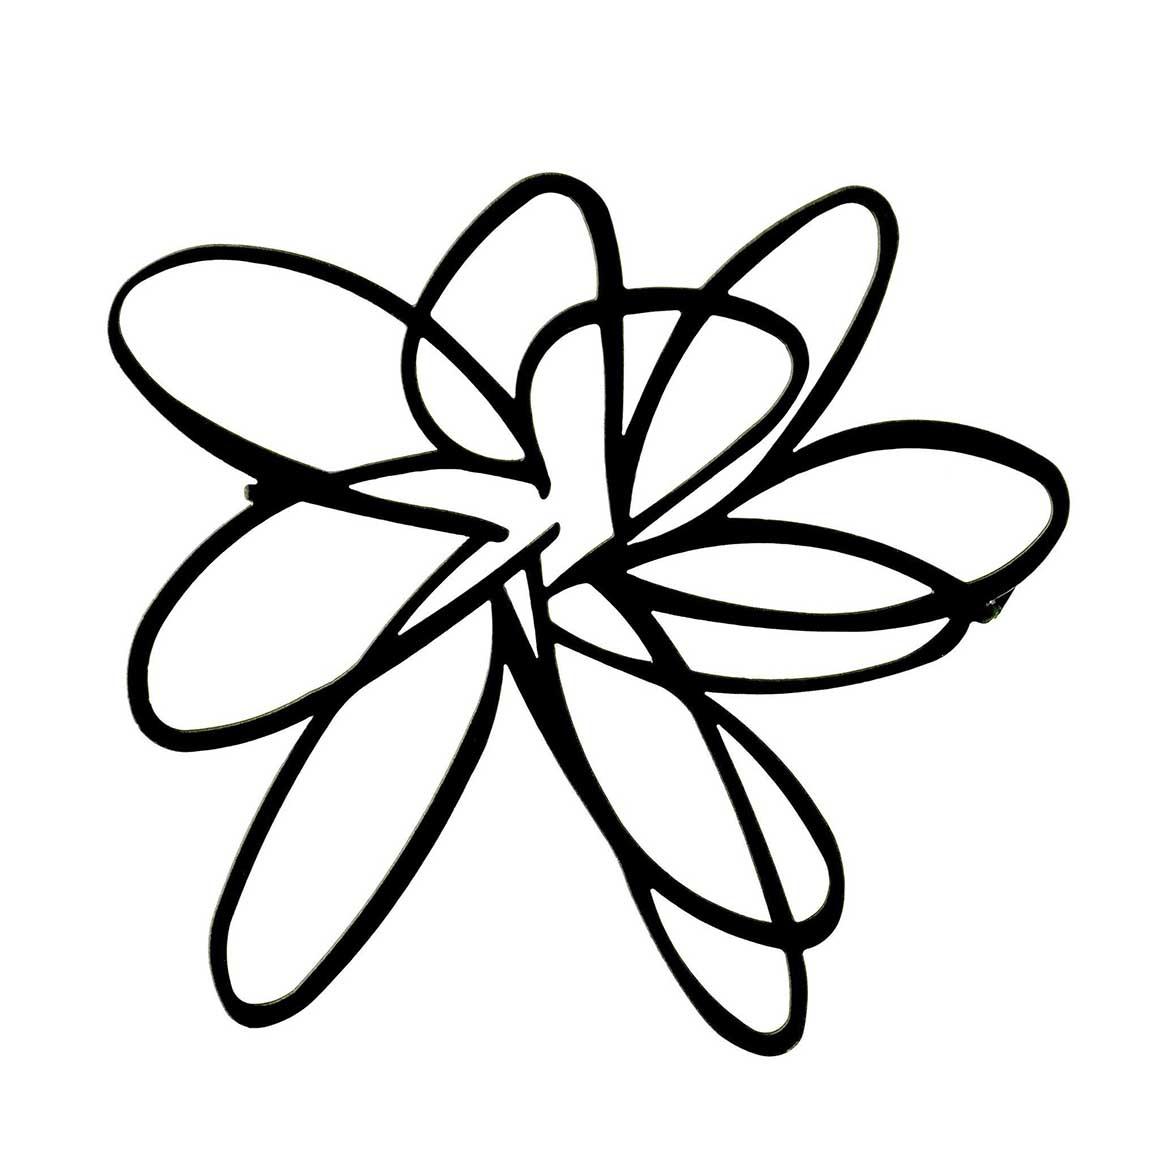 Brooch-Flower-Black | Trada Marketplace